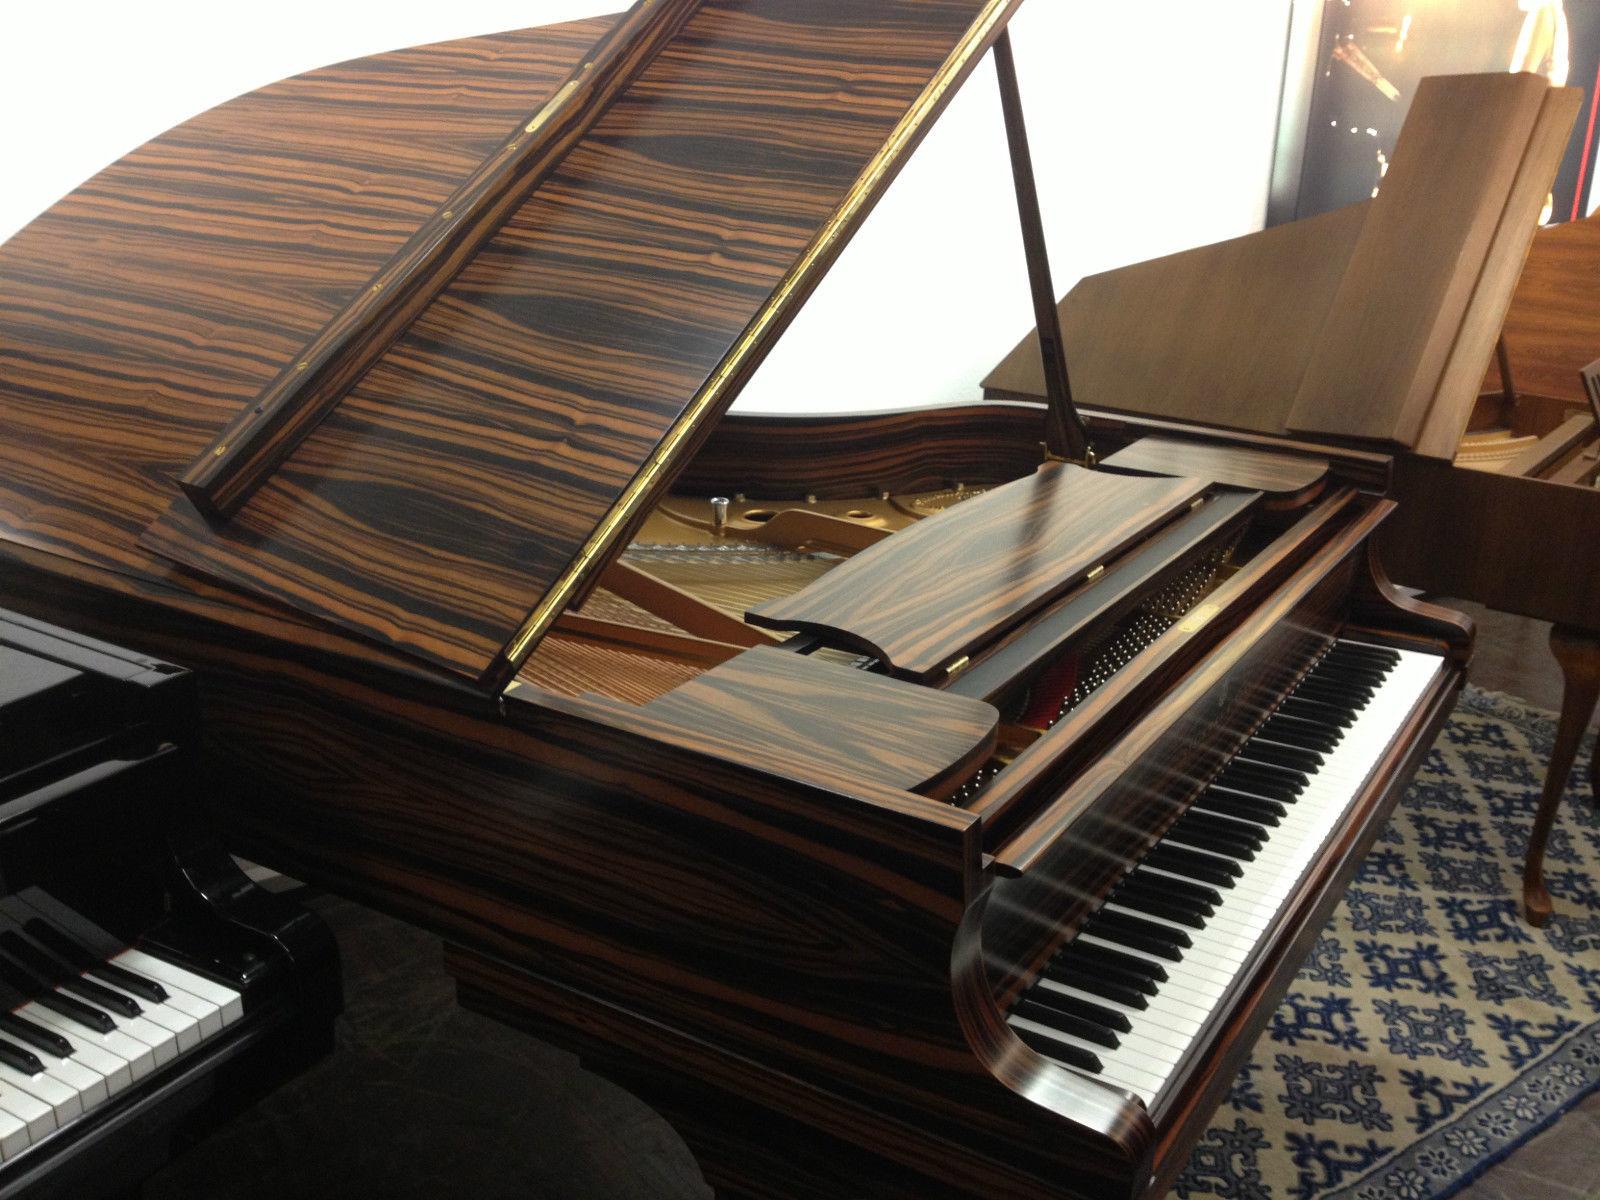 steinway sons a 188 fl gel makassar musikhaus schlaile karlsruhe. Black Bedroom Furniture Sets. Home Design Ideas